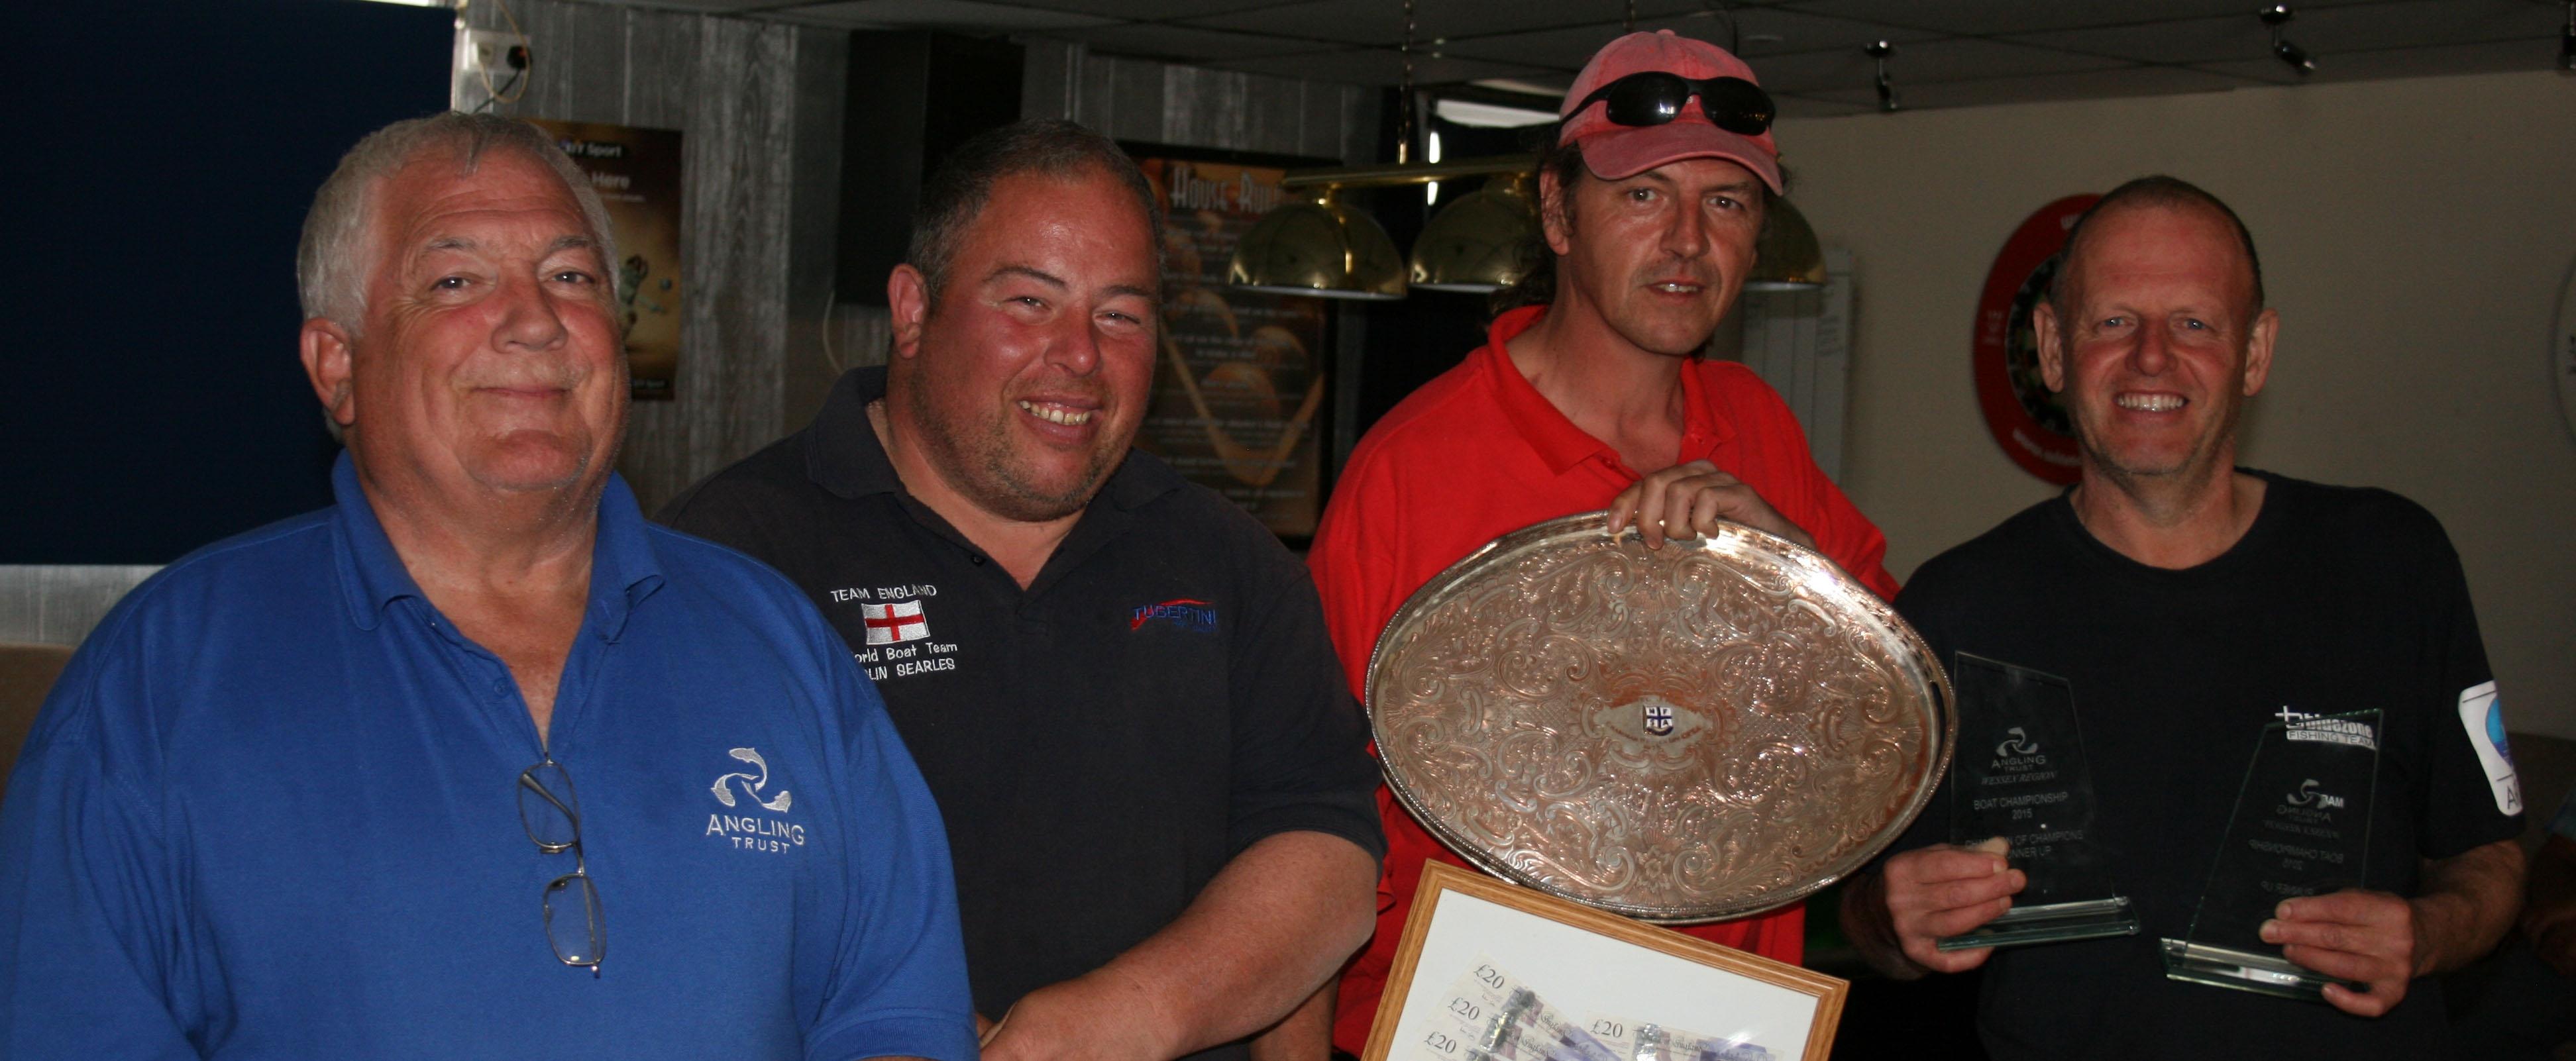 Boat Championship pic 2015